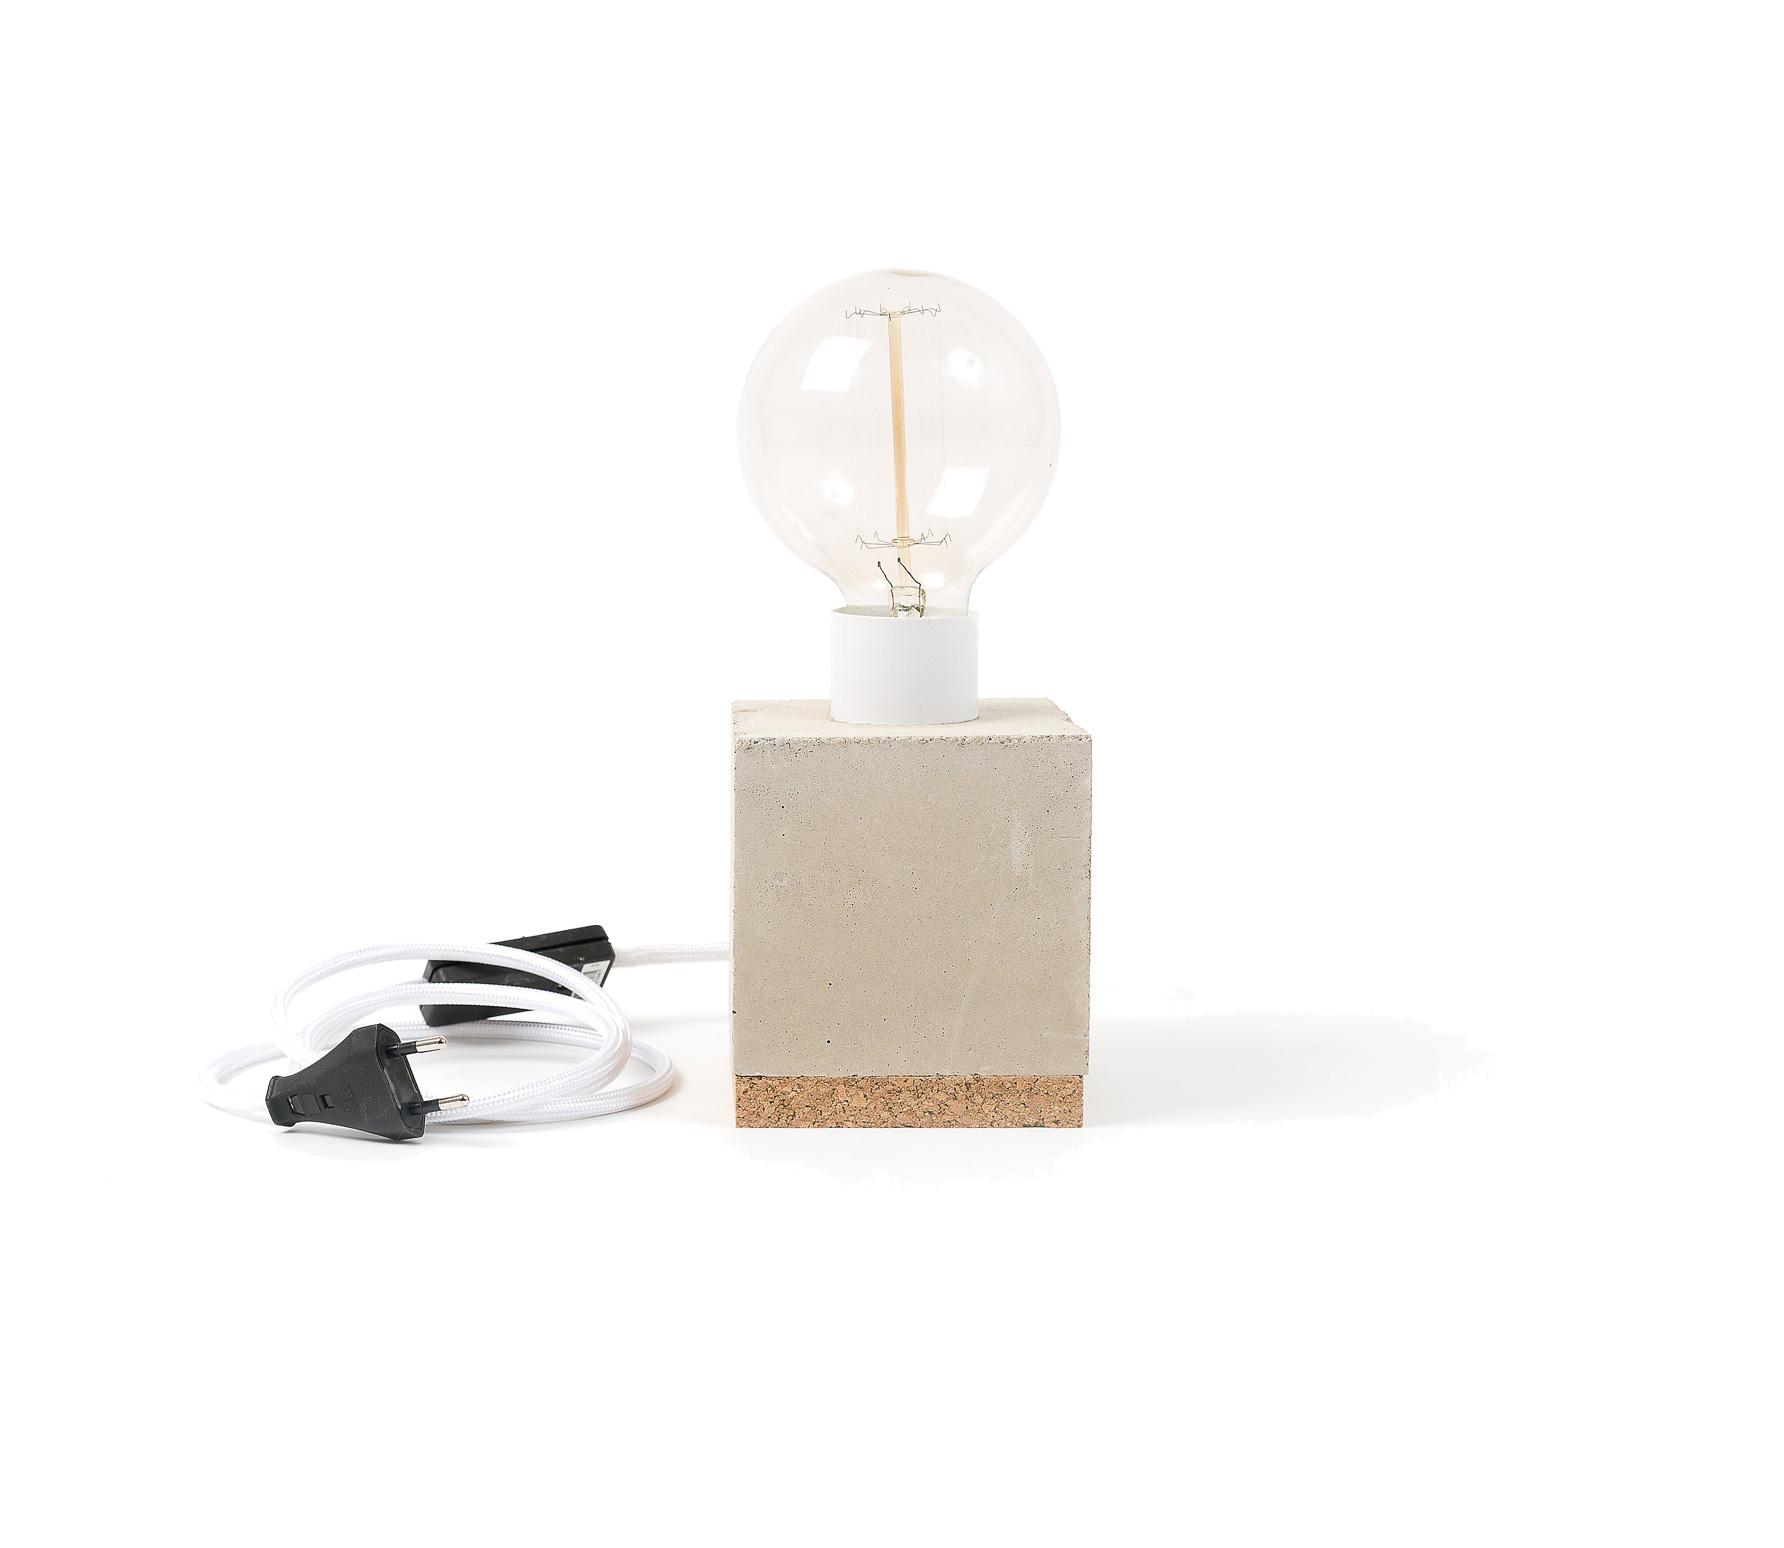 Basiclabel Betonlamp wit incl lamp vrijstaand